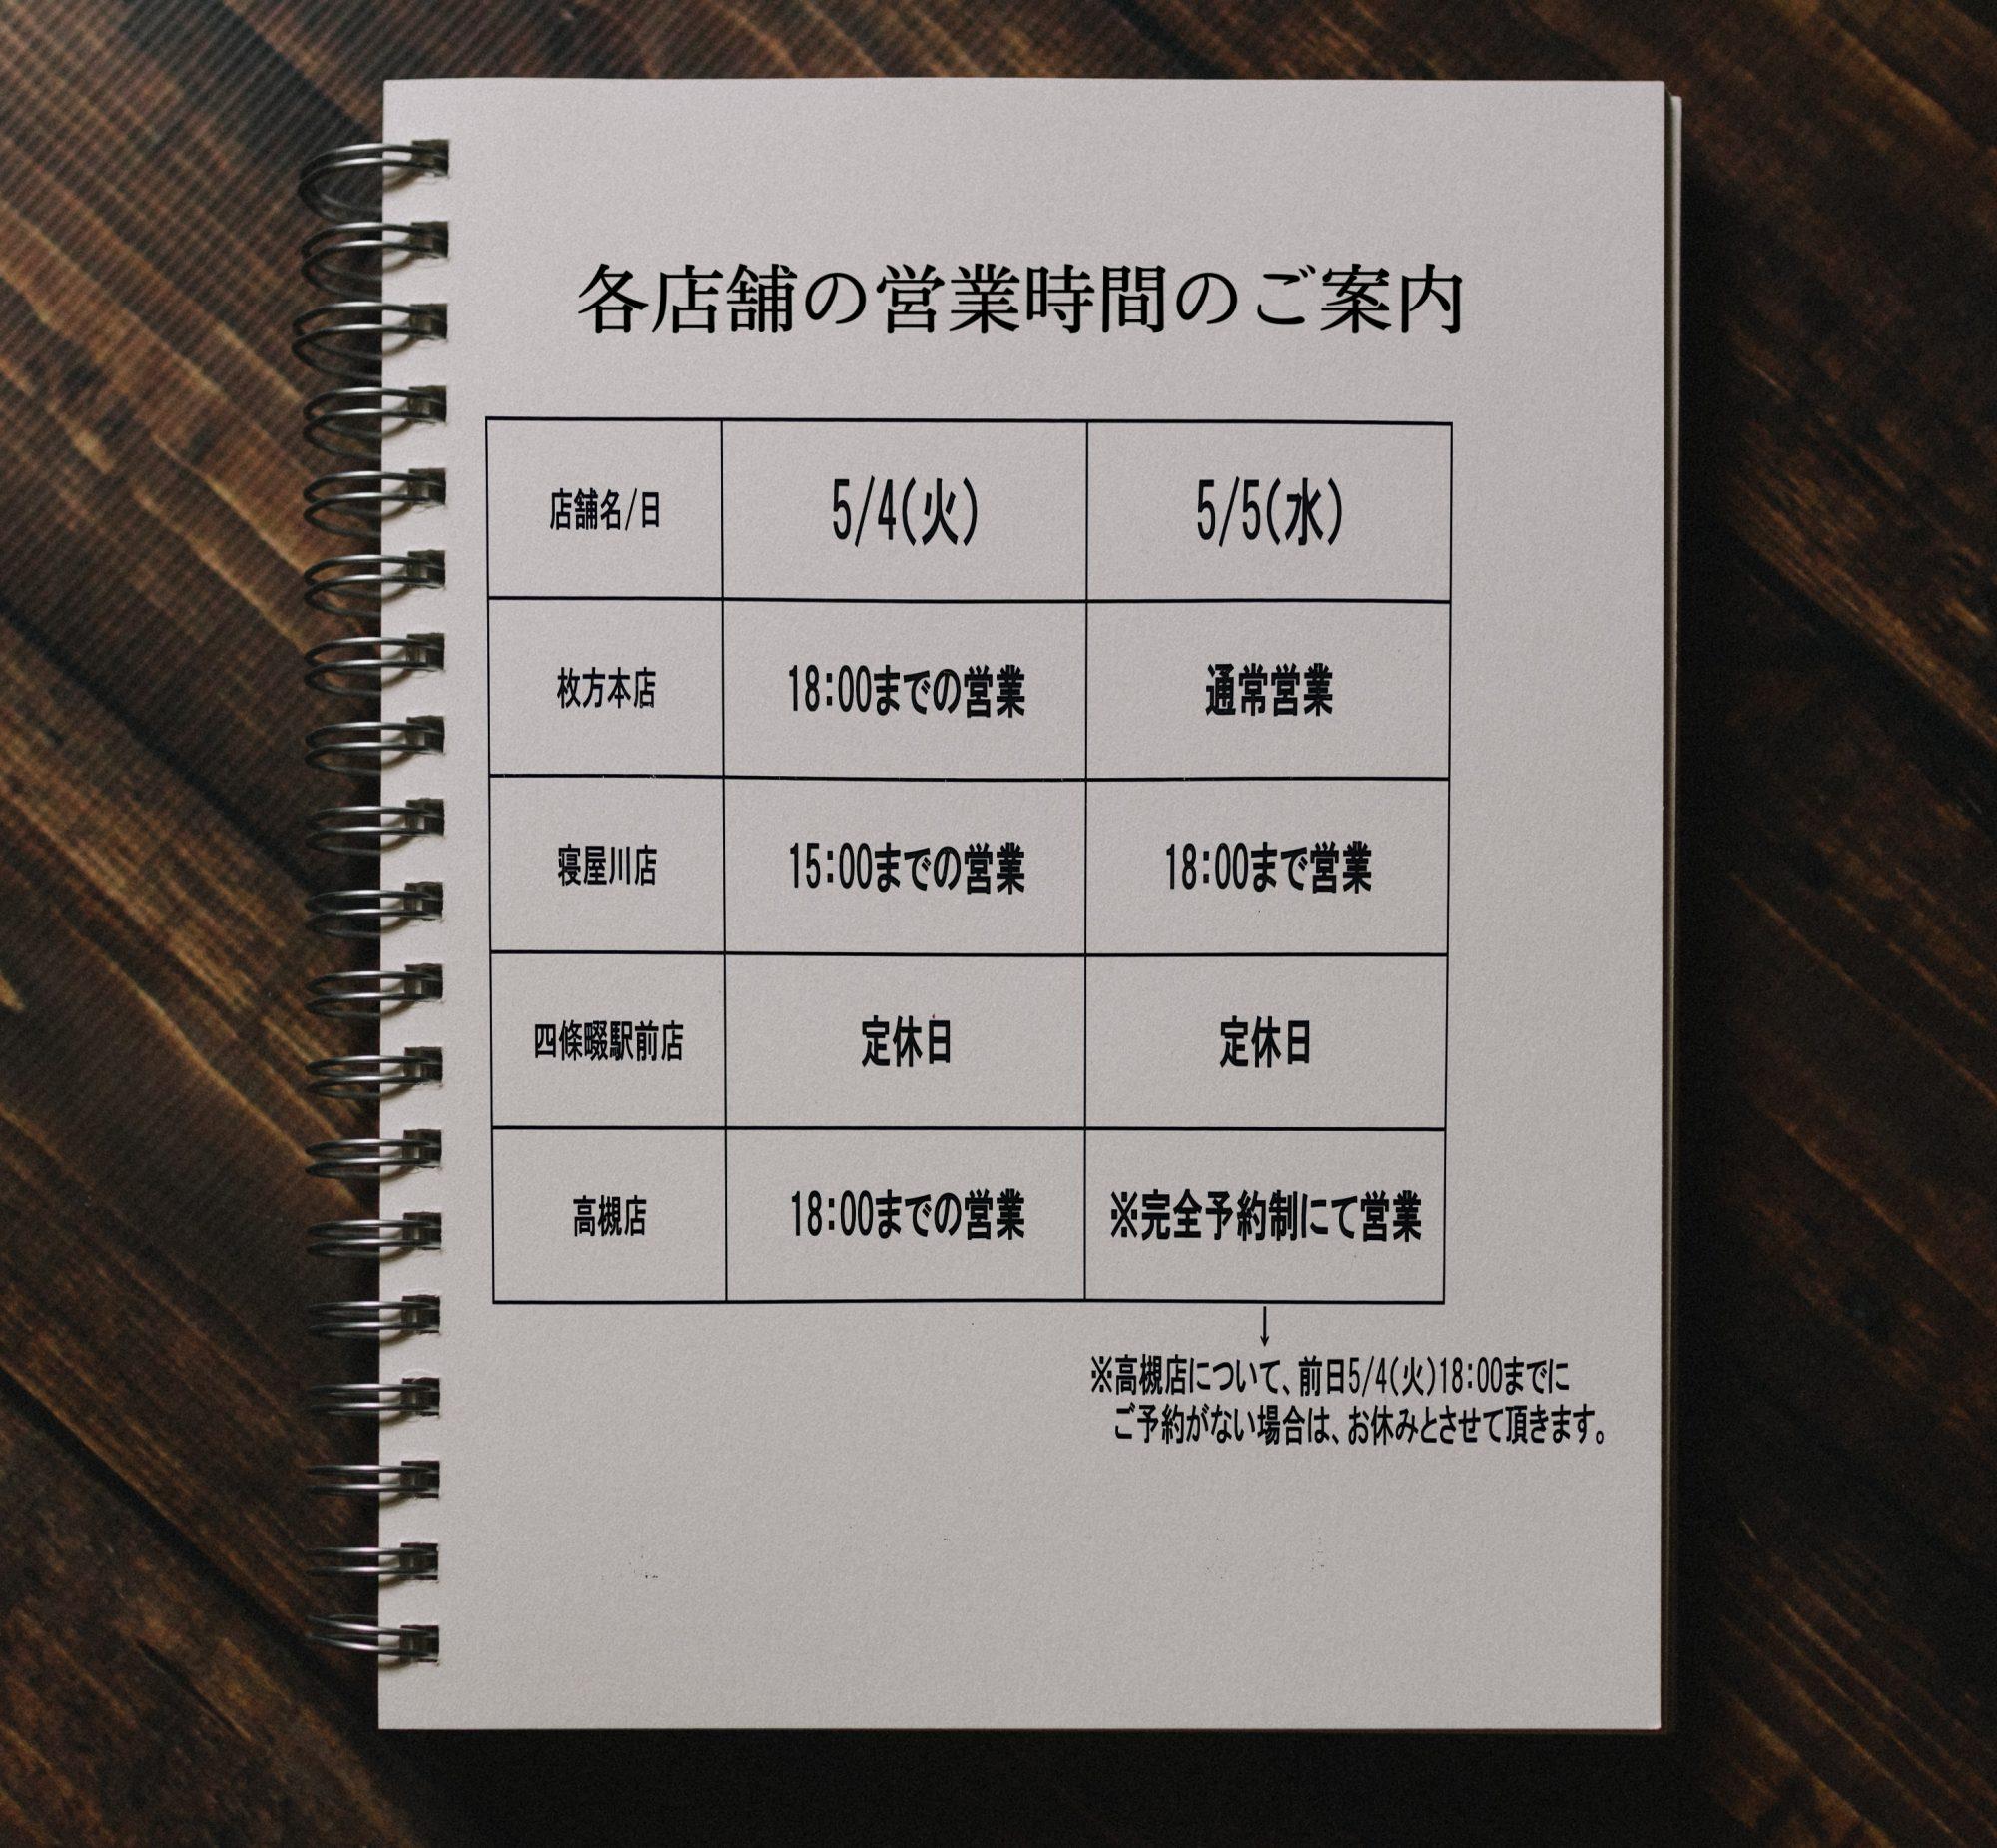 "{""source_sid"":""058E759D-82A8-4579-844A-A46BAEBA10B3_1620044917612"",""subsource"":""done_button"",""uid"":""058E759D-82A8-4579-844A-A46BAEBA10B3_1620044917193"",""source"":""other"",""origin"":""picsart"",""sources"":[""346834504001201""]}"